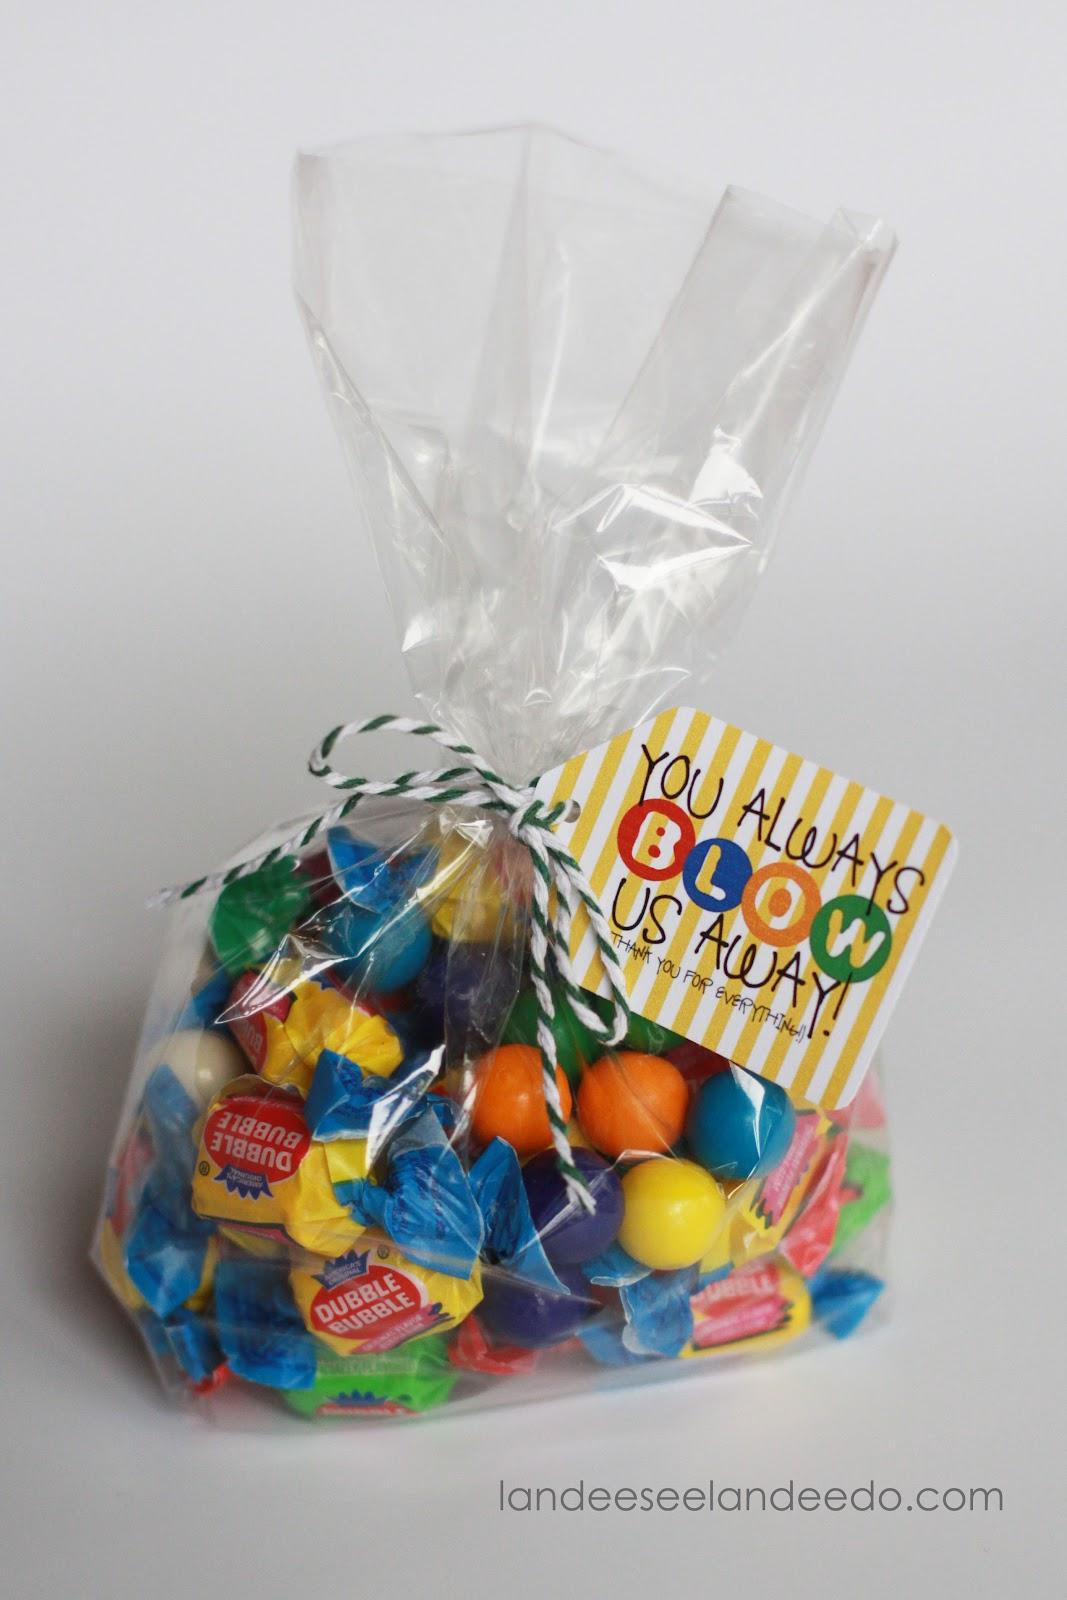 Teacher Appreciation: You Blow Us Away! - landeelu.com